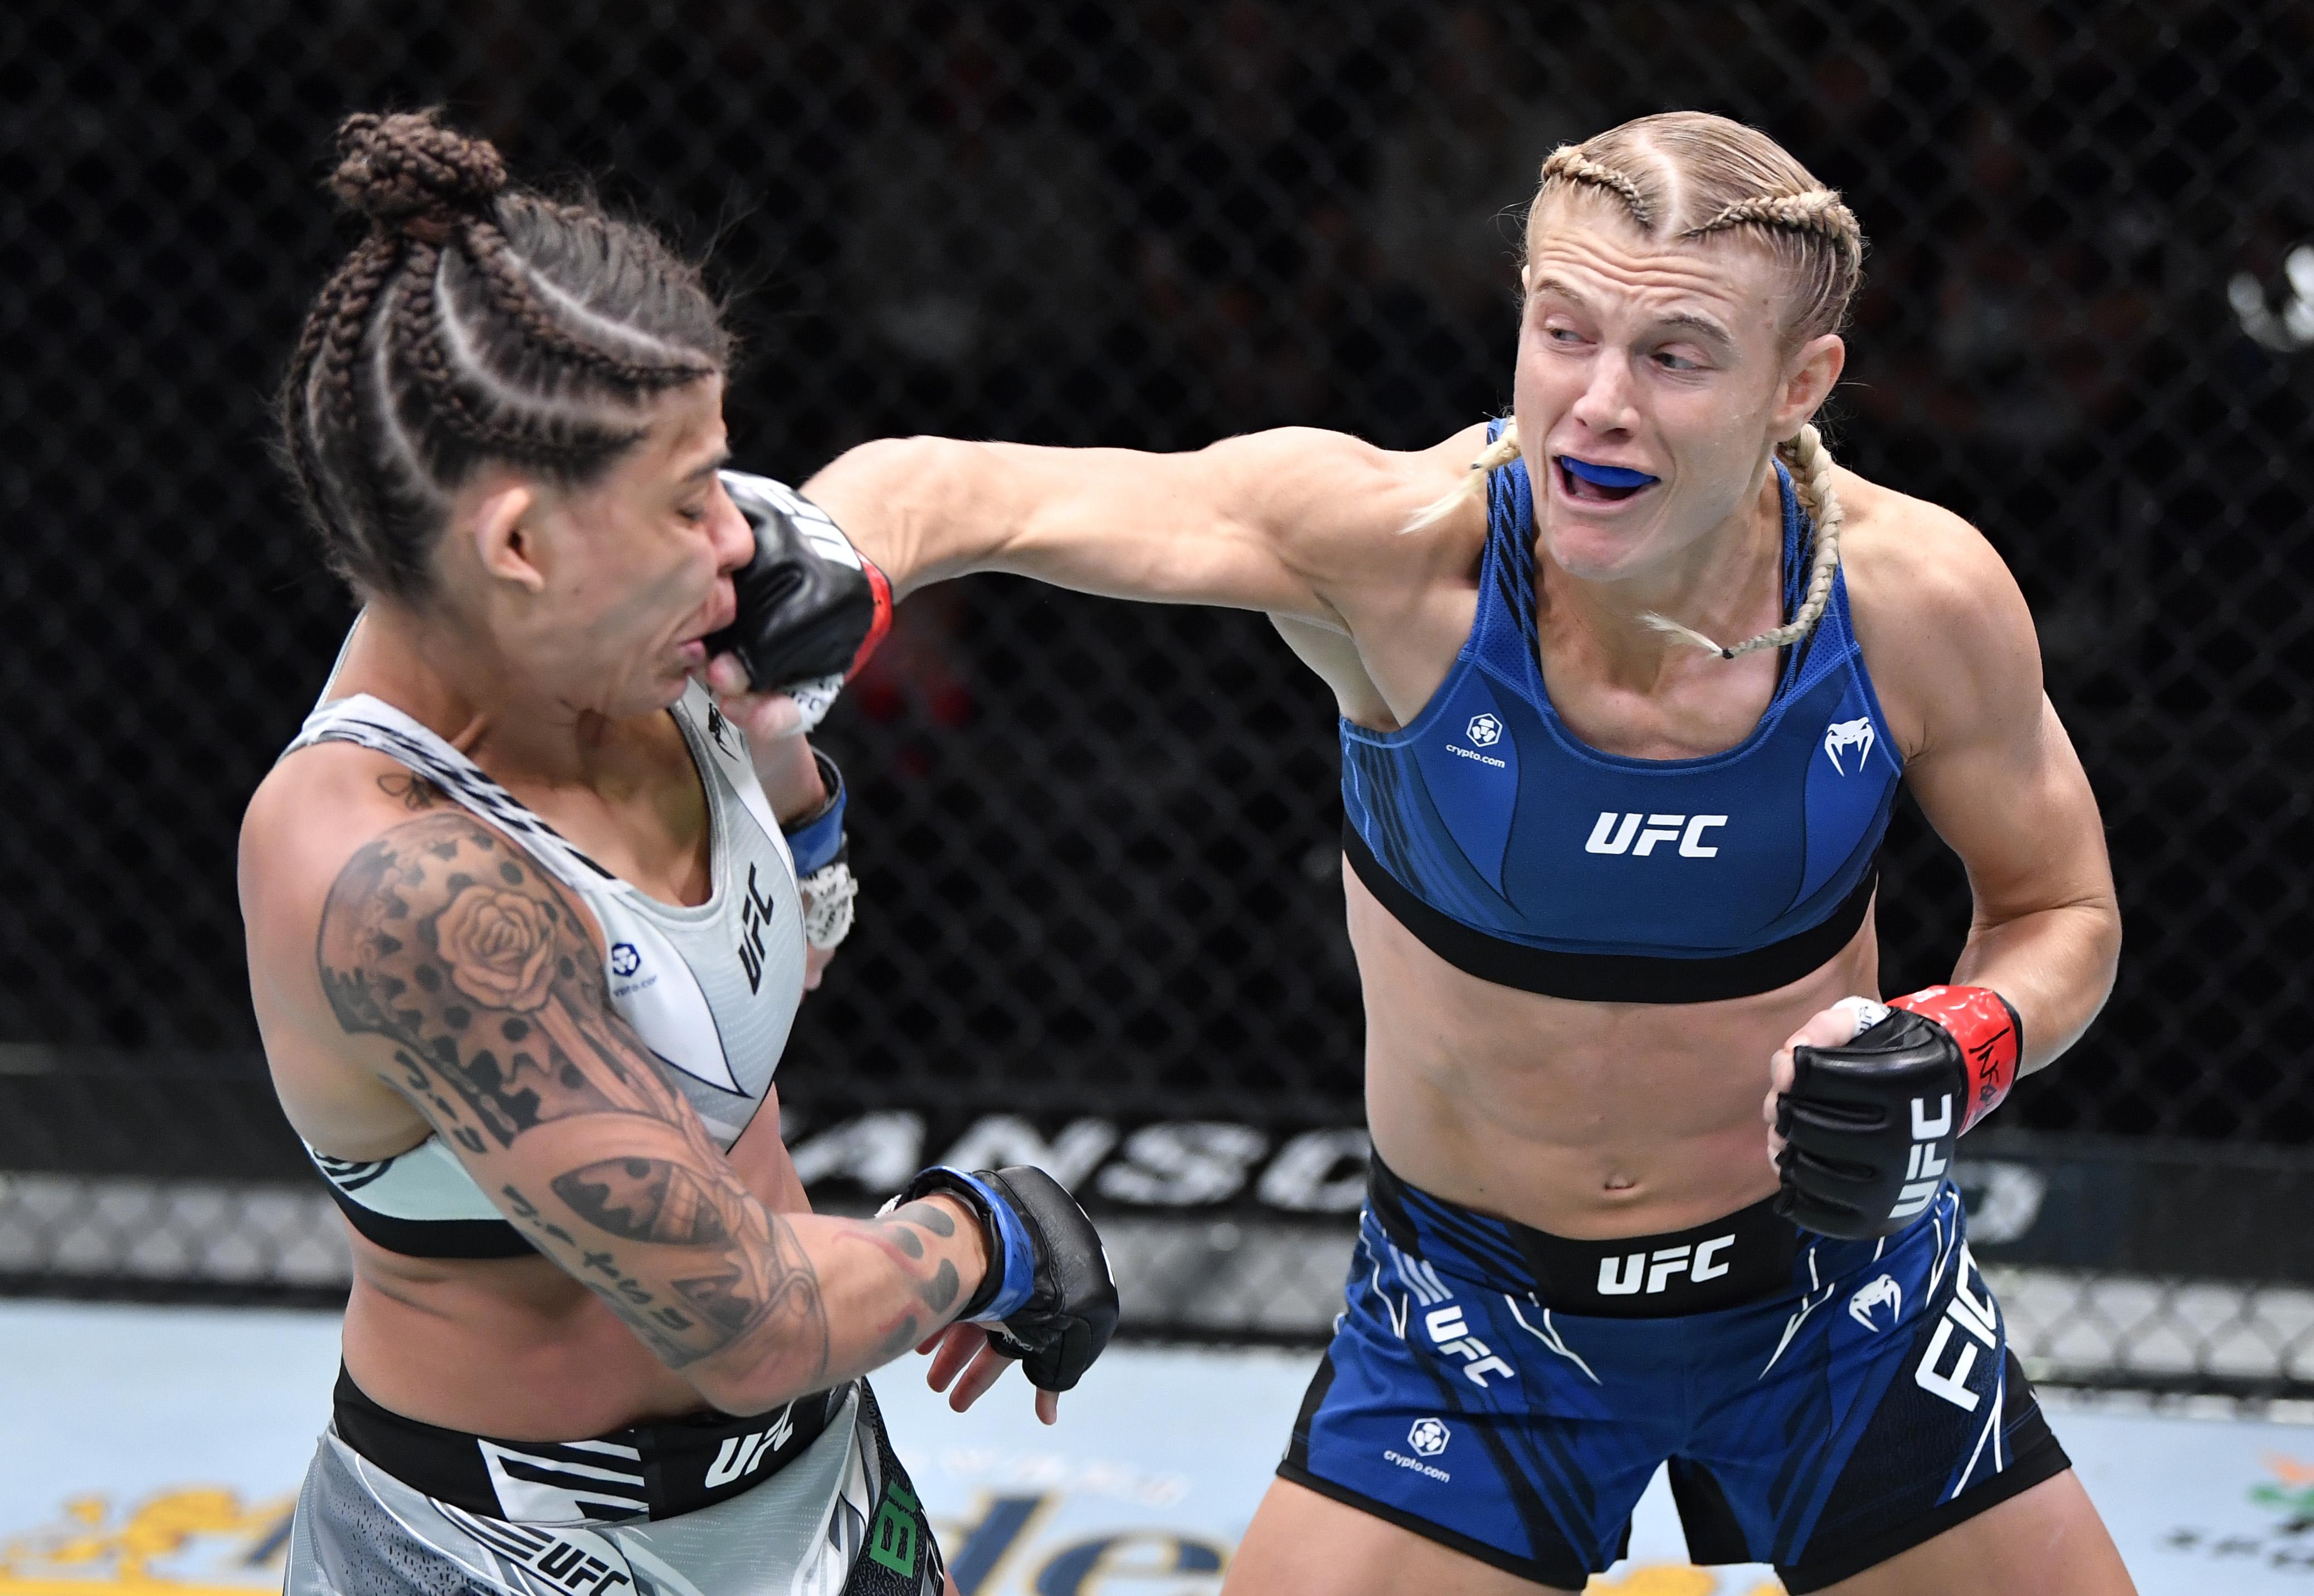 UFC Fight Night: Fiorot v Bueno Silva